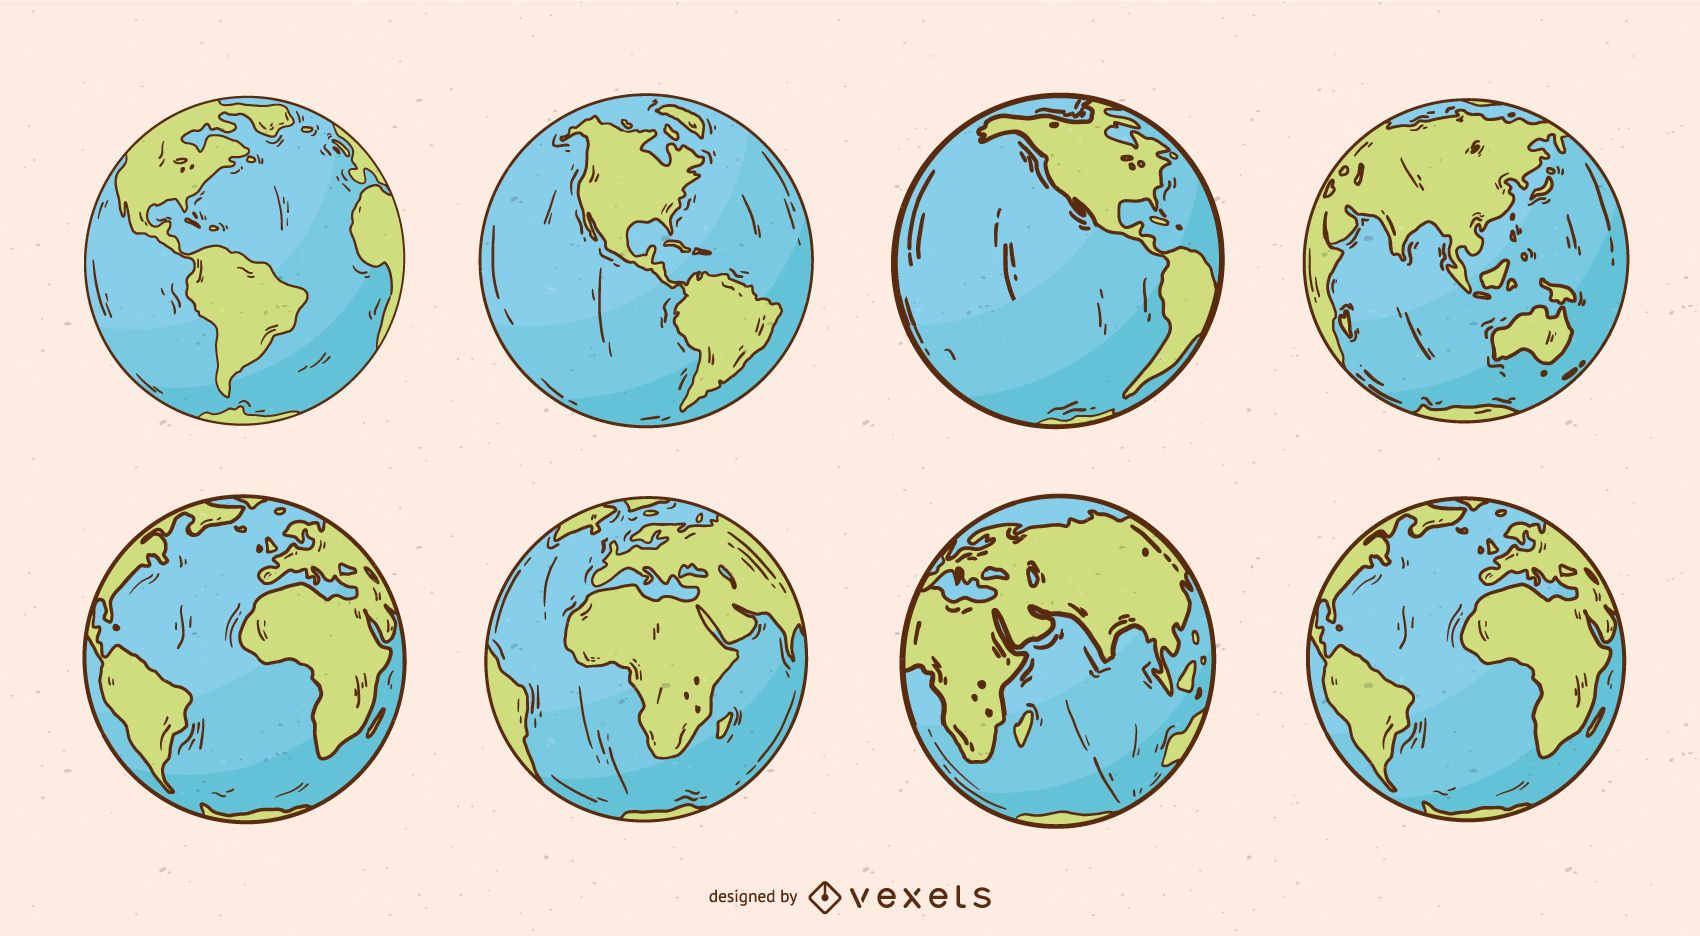 Planet Earth Globe Illustration Pack